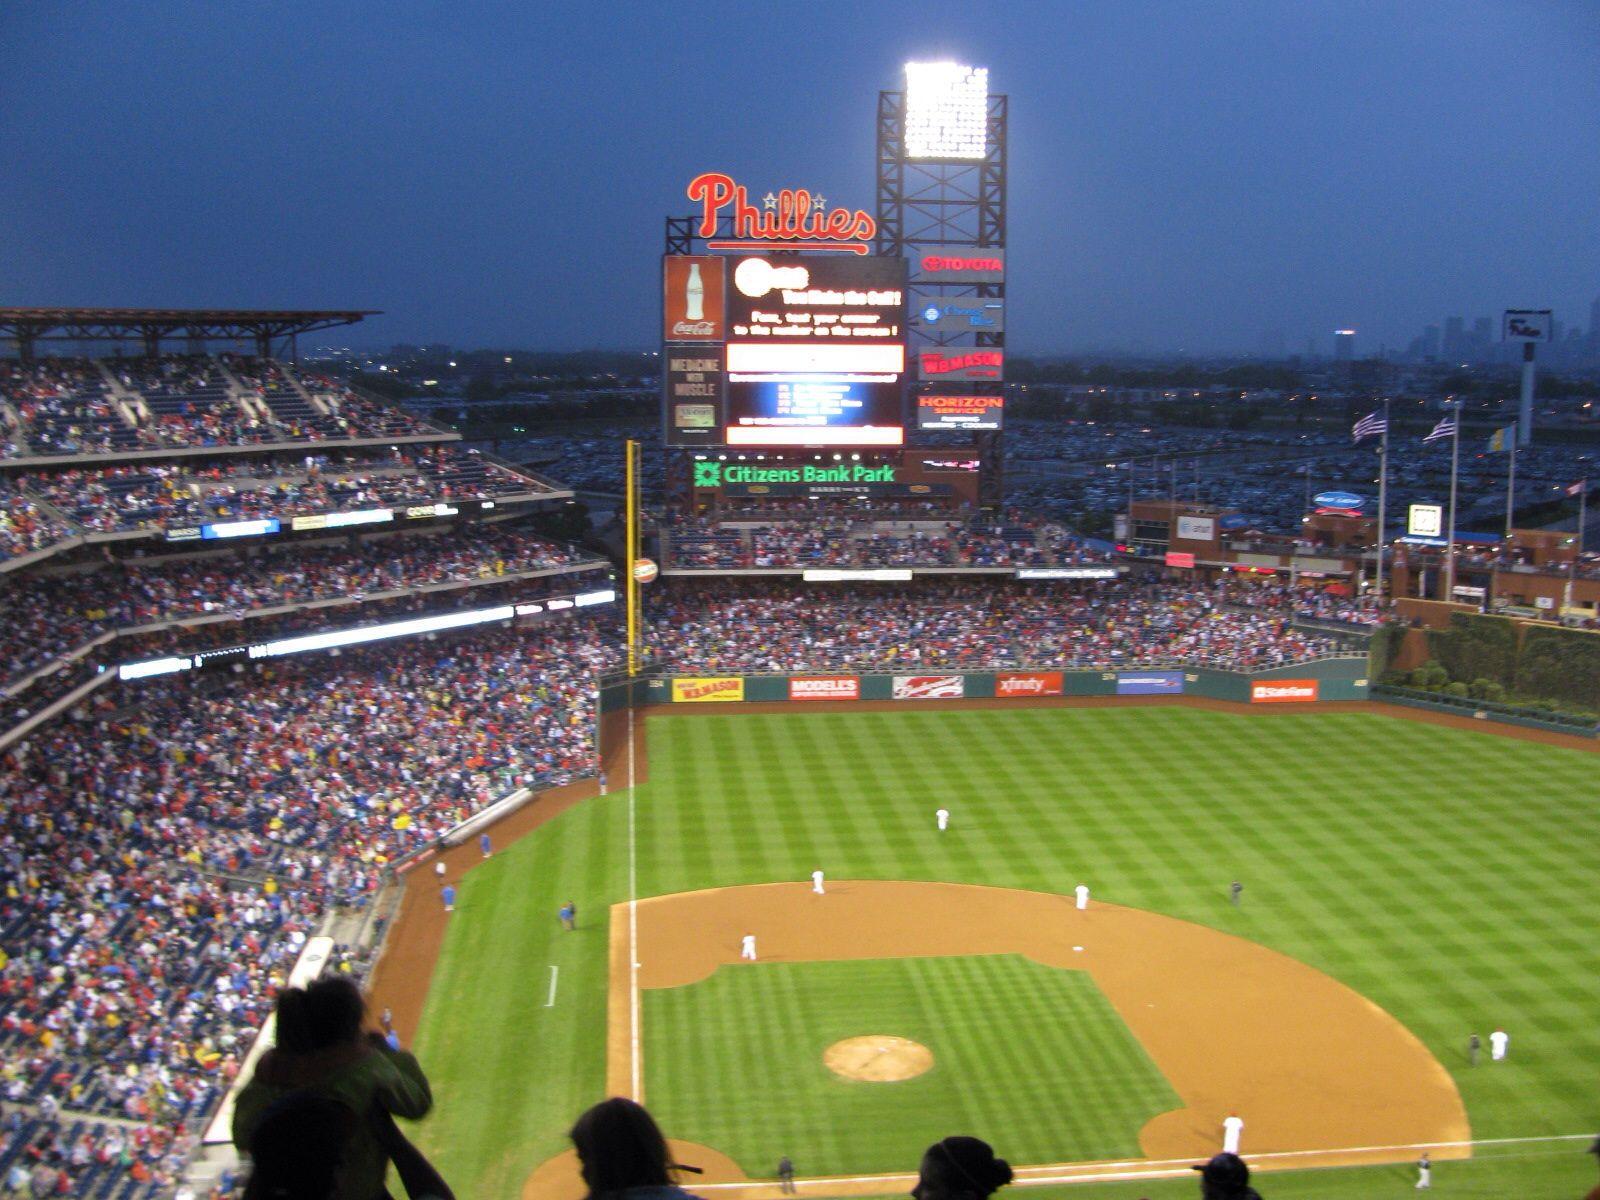 Phillies stadion